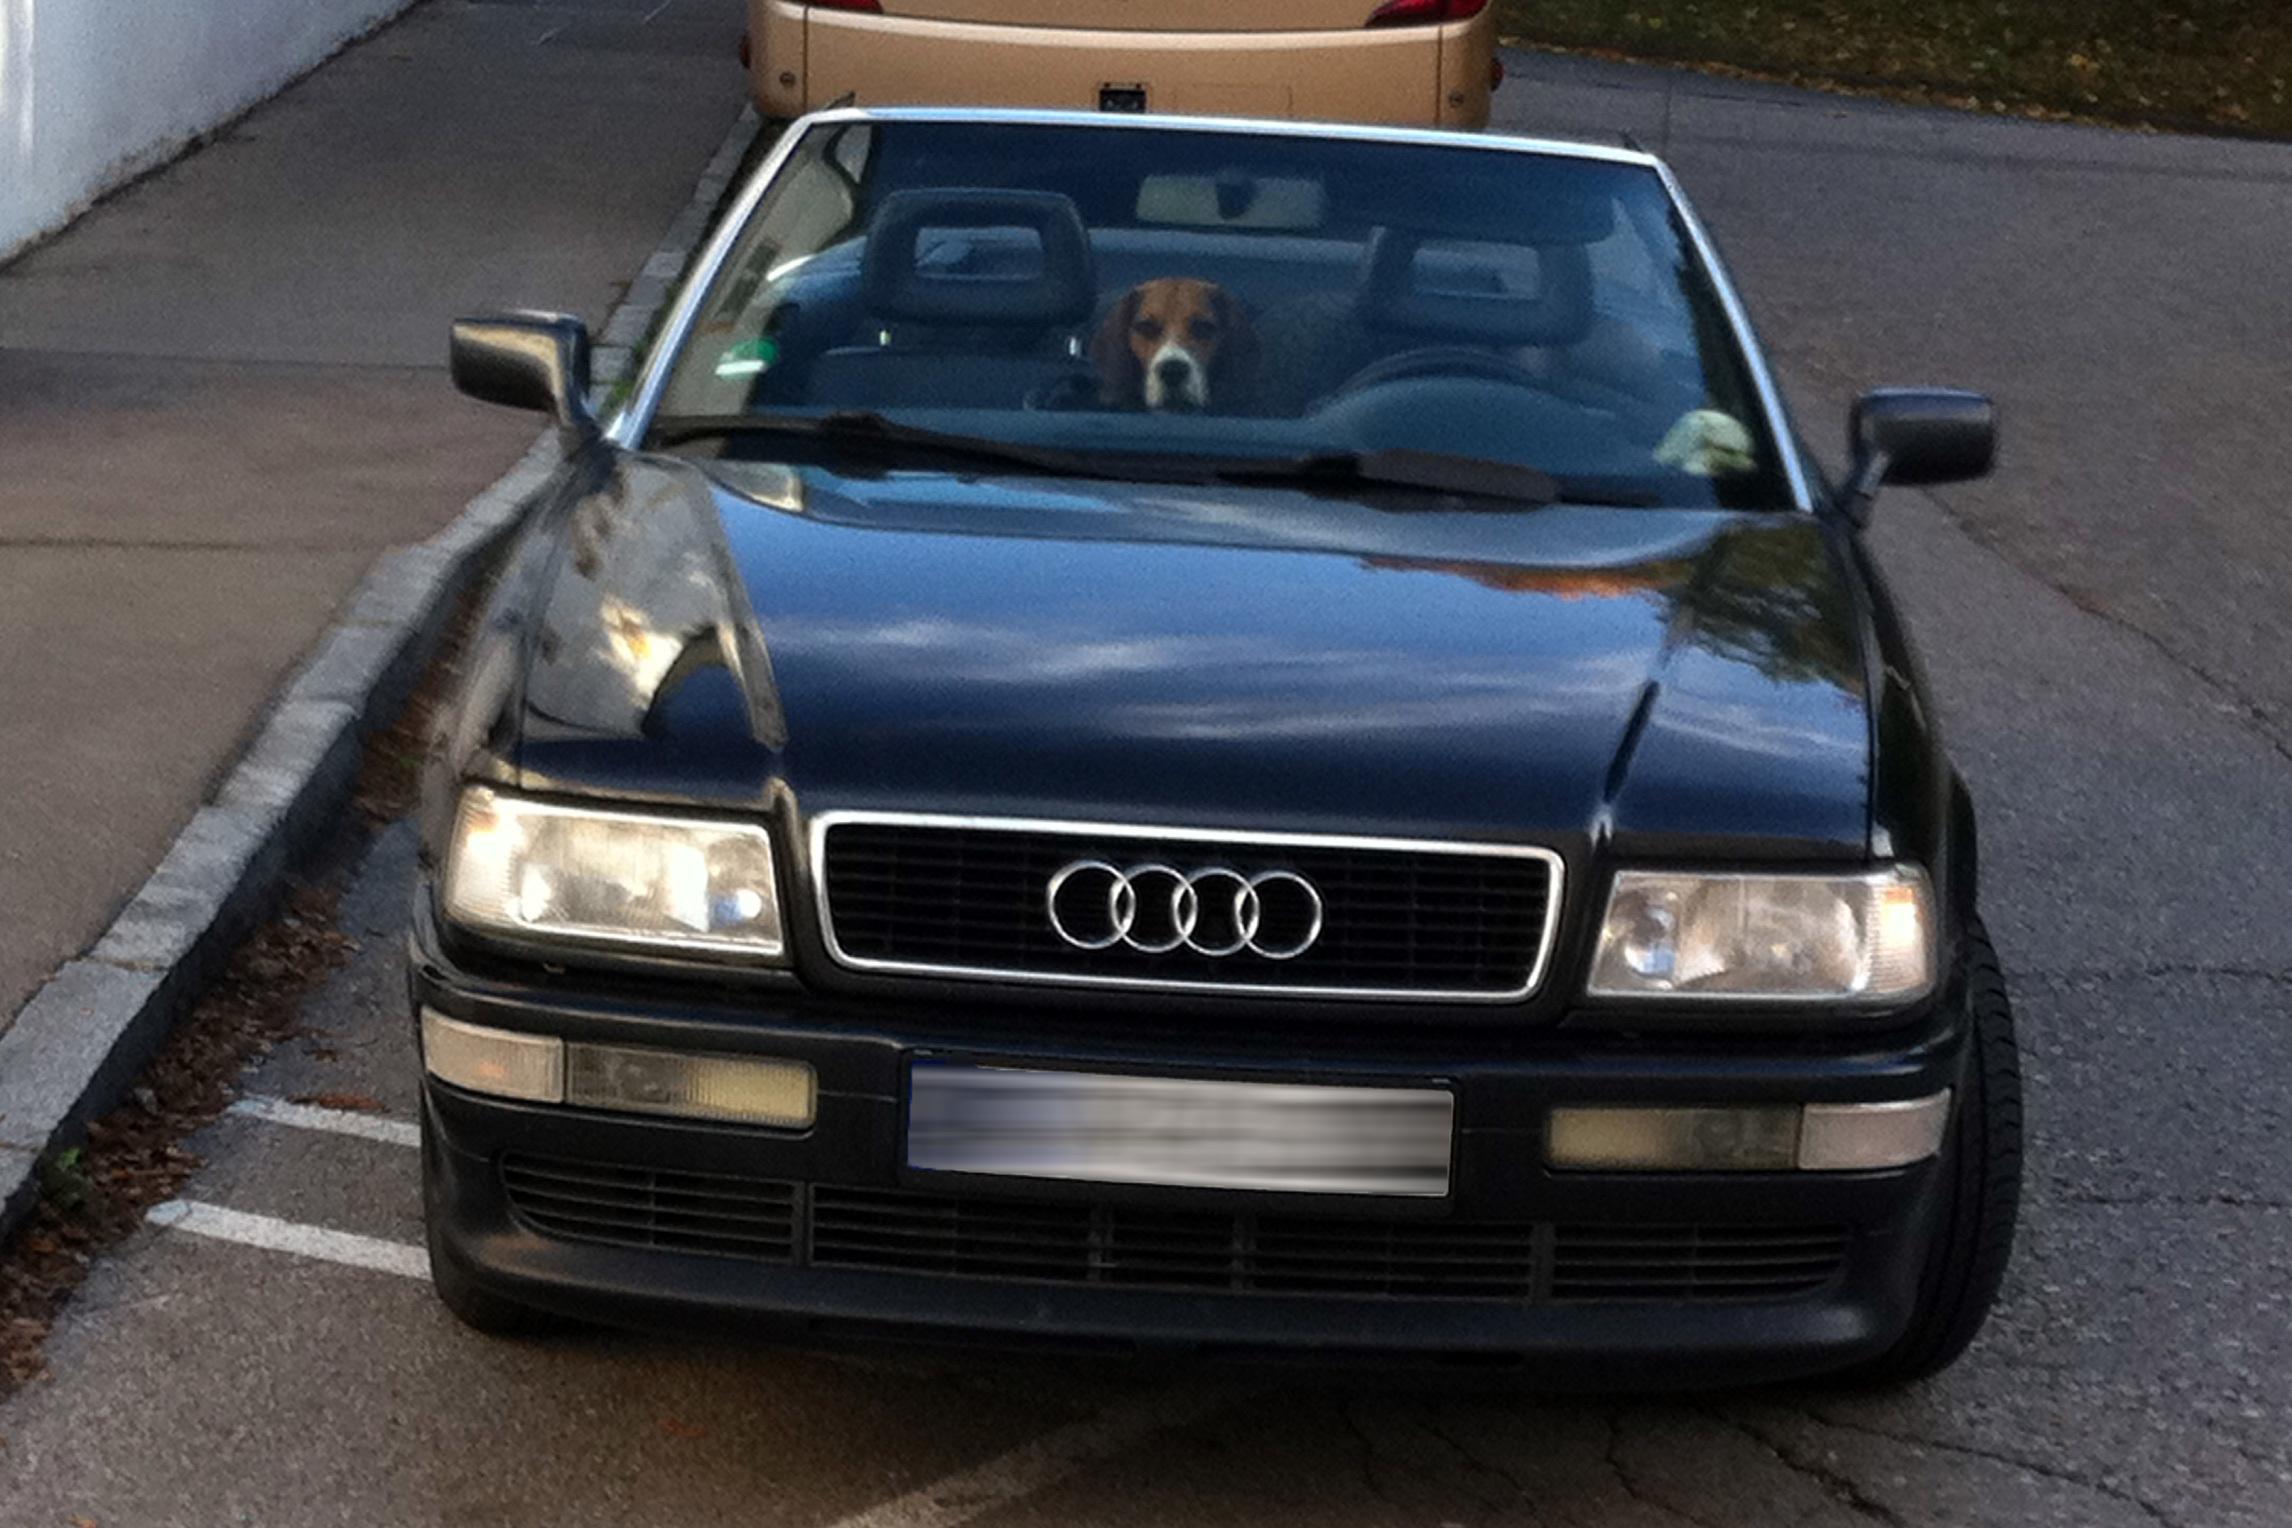 Audi Kabriolet mit Hund